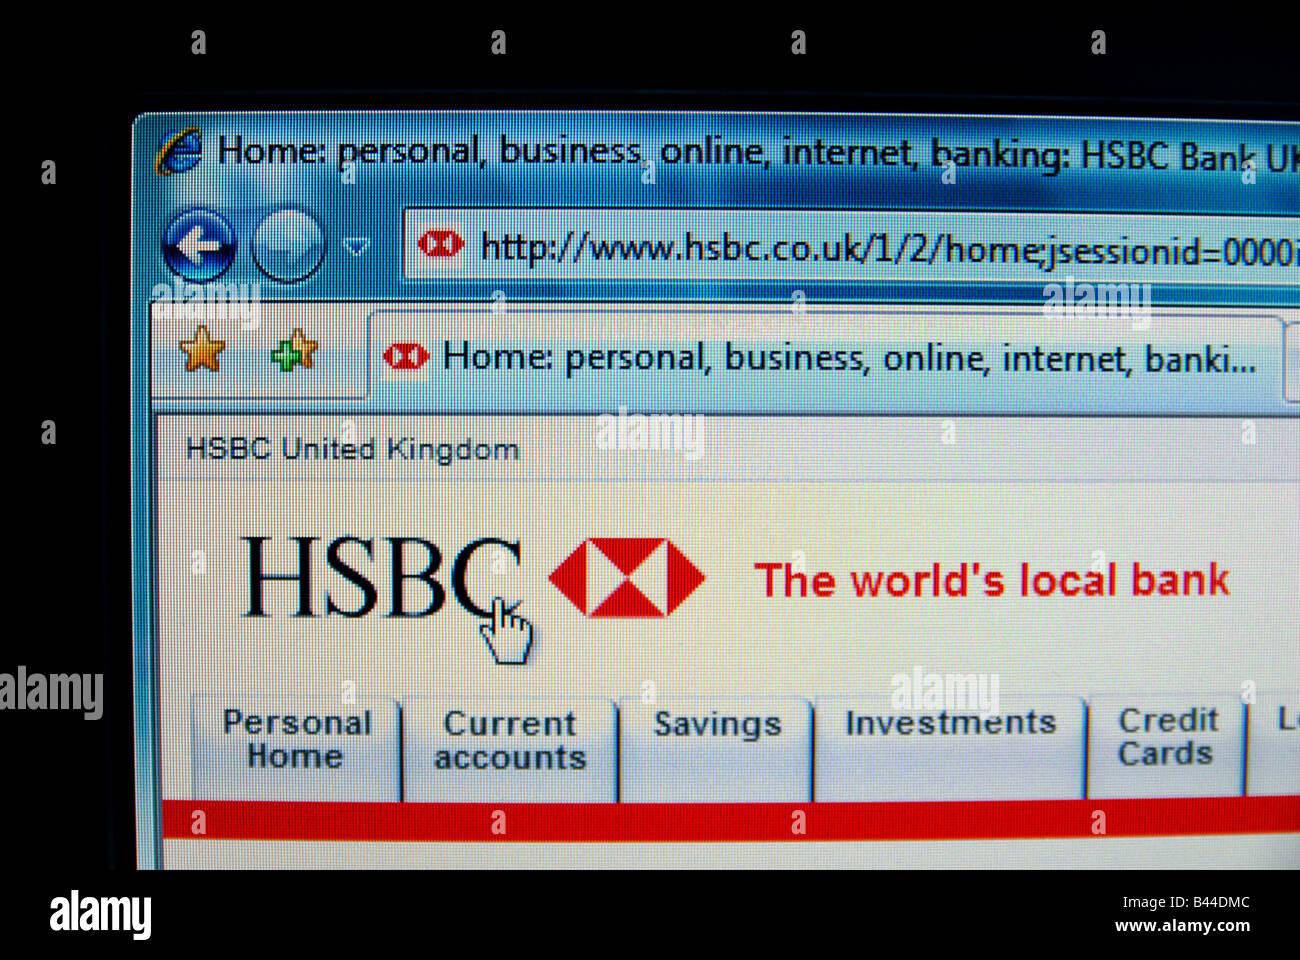 The HSBC banks website, creative focus/composition Stock